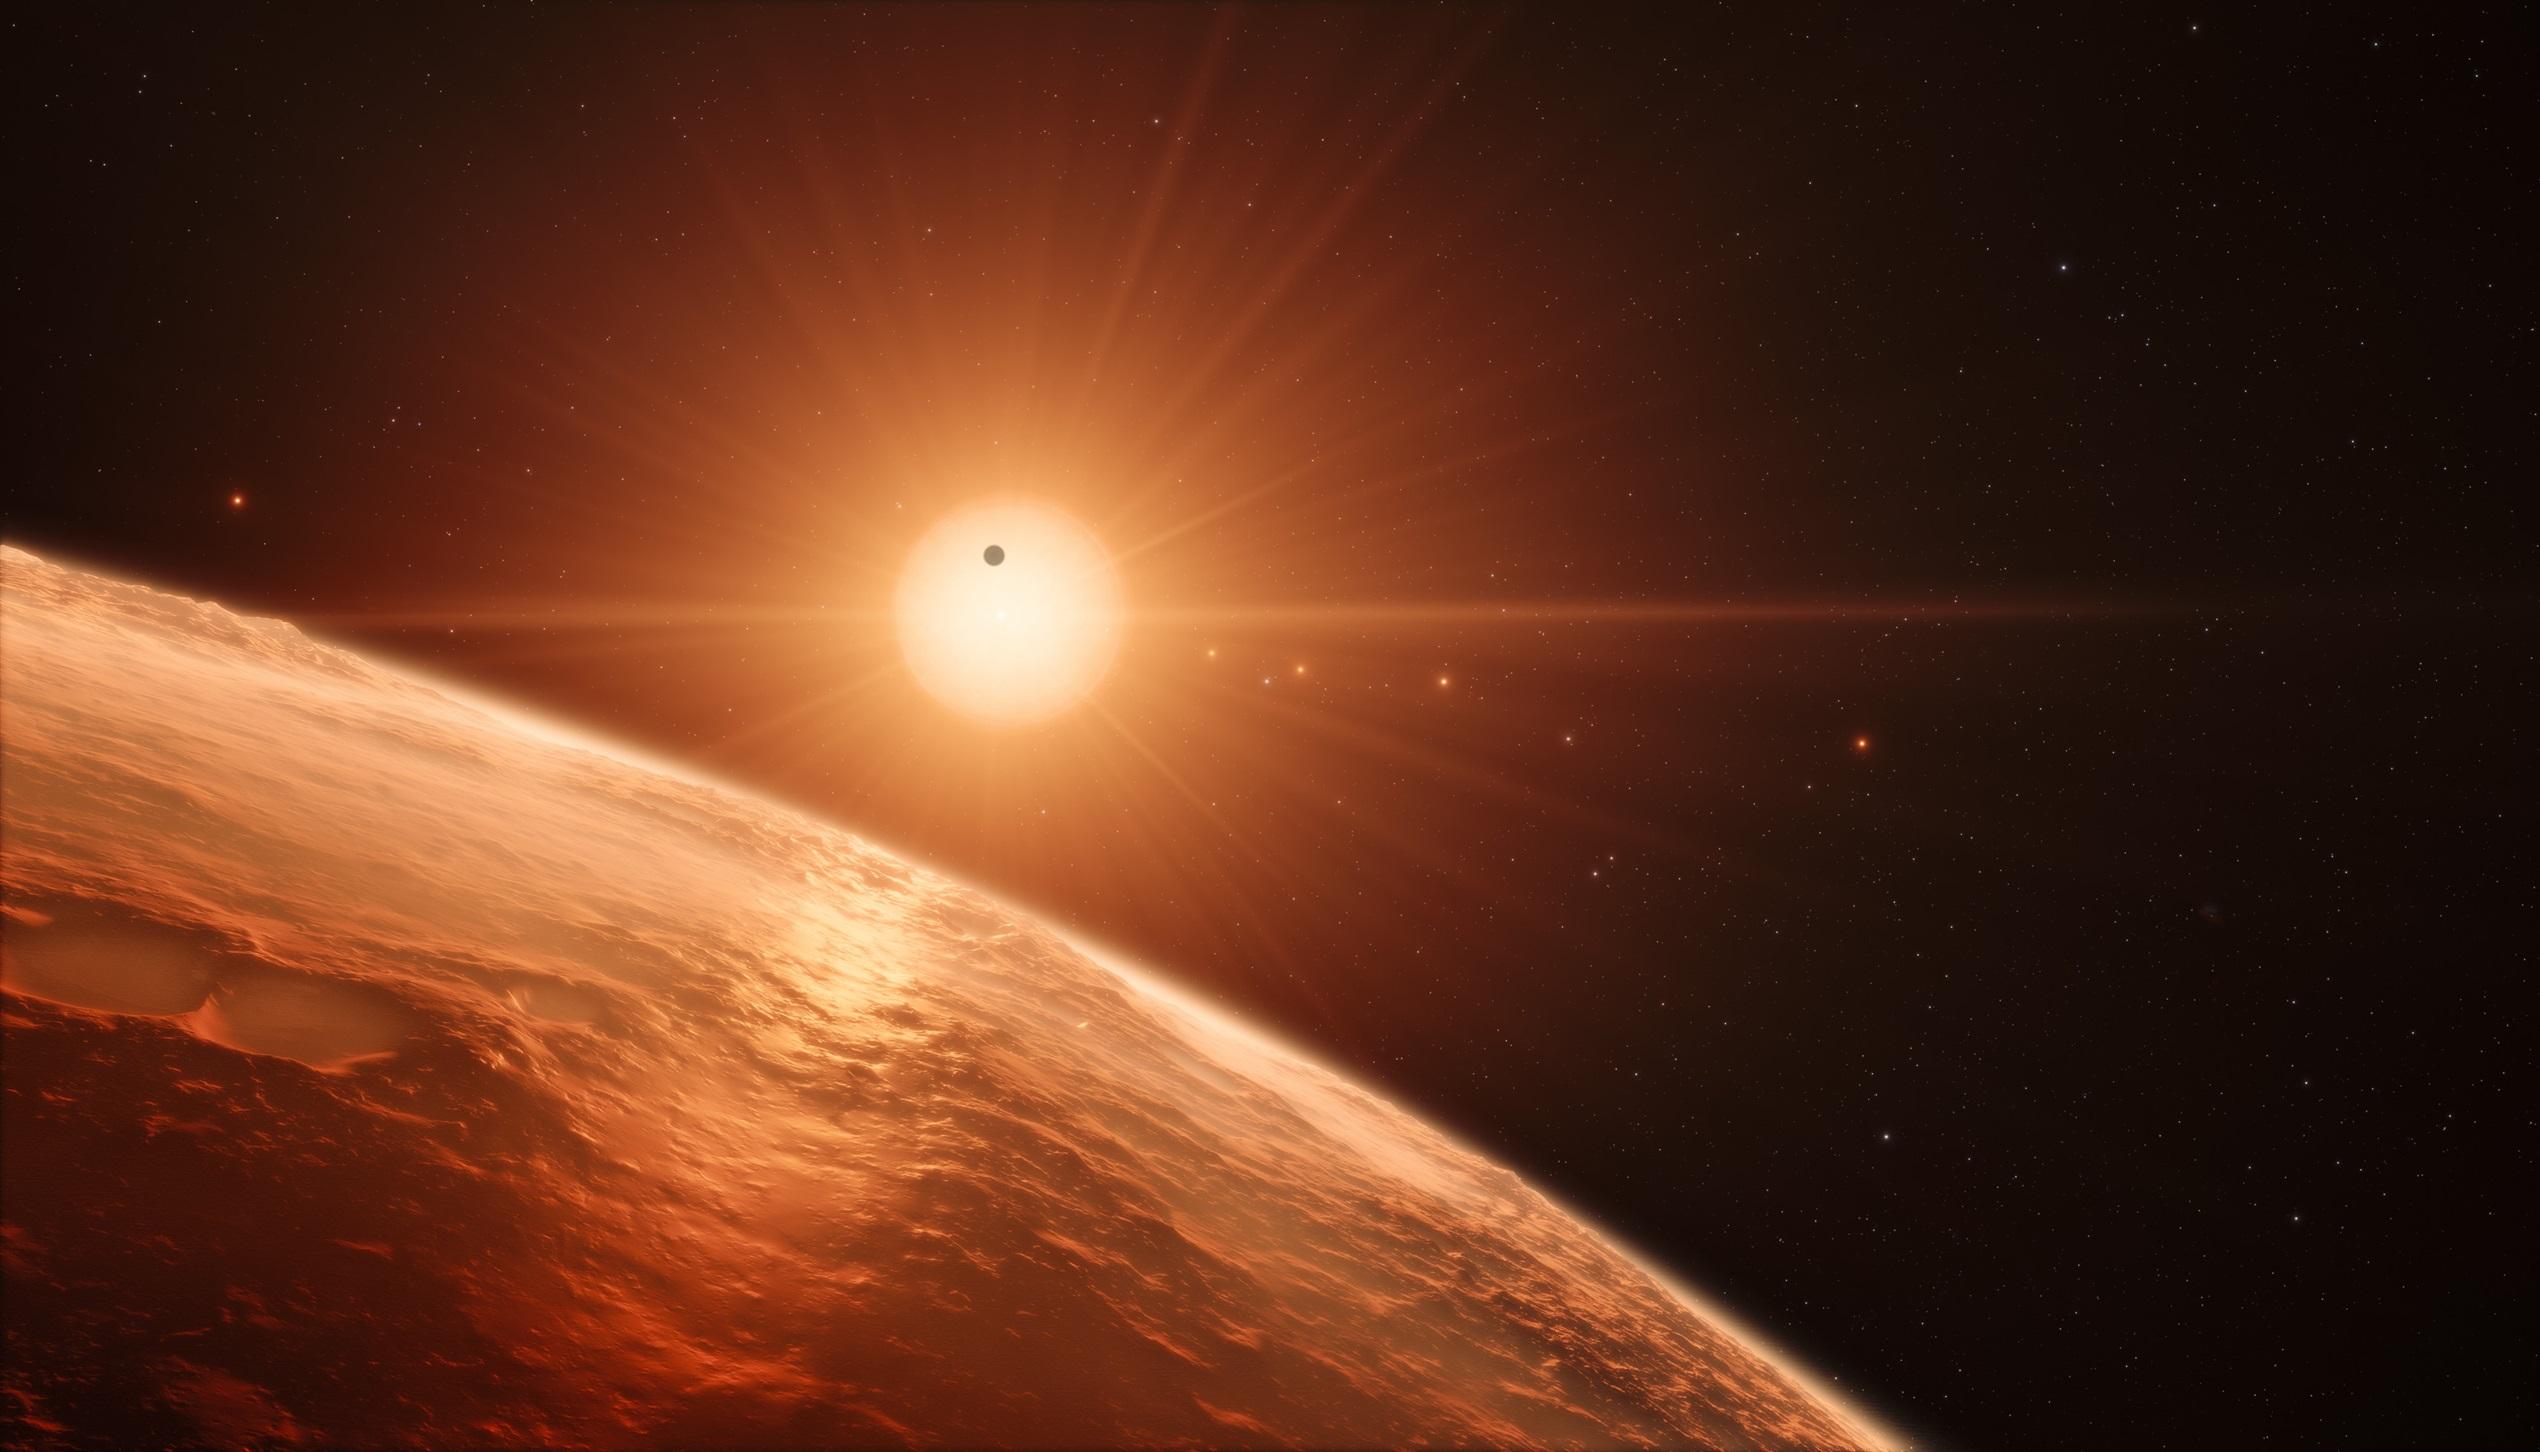 General 2540x1452 concept art universe Sun stars sun rays planet space art space